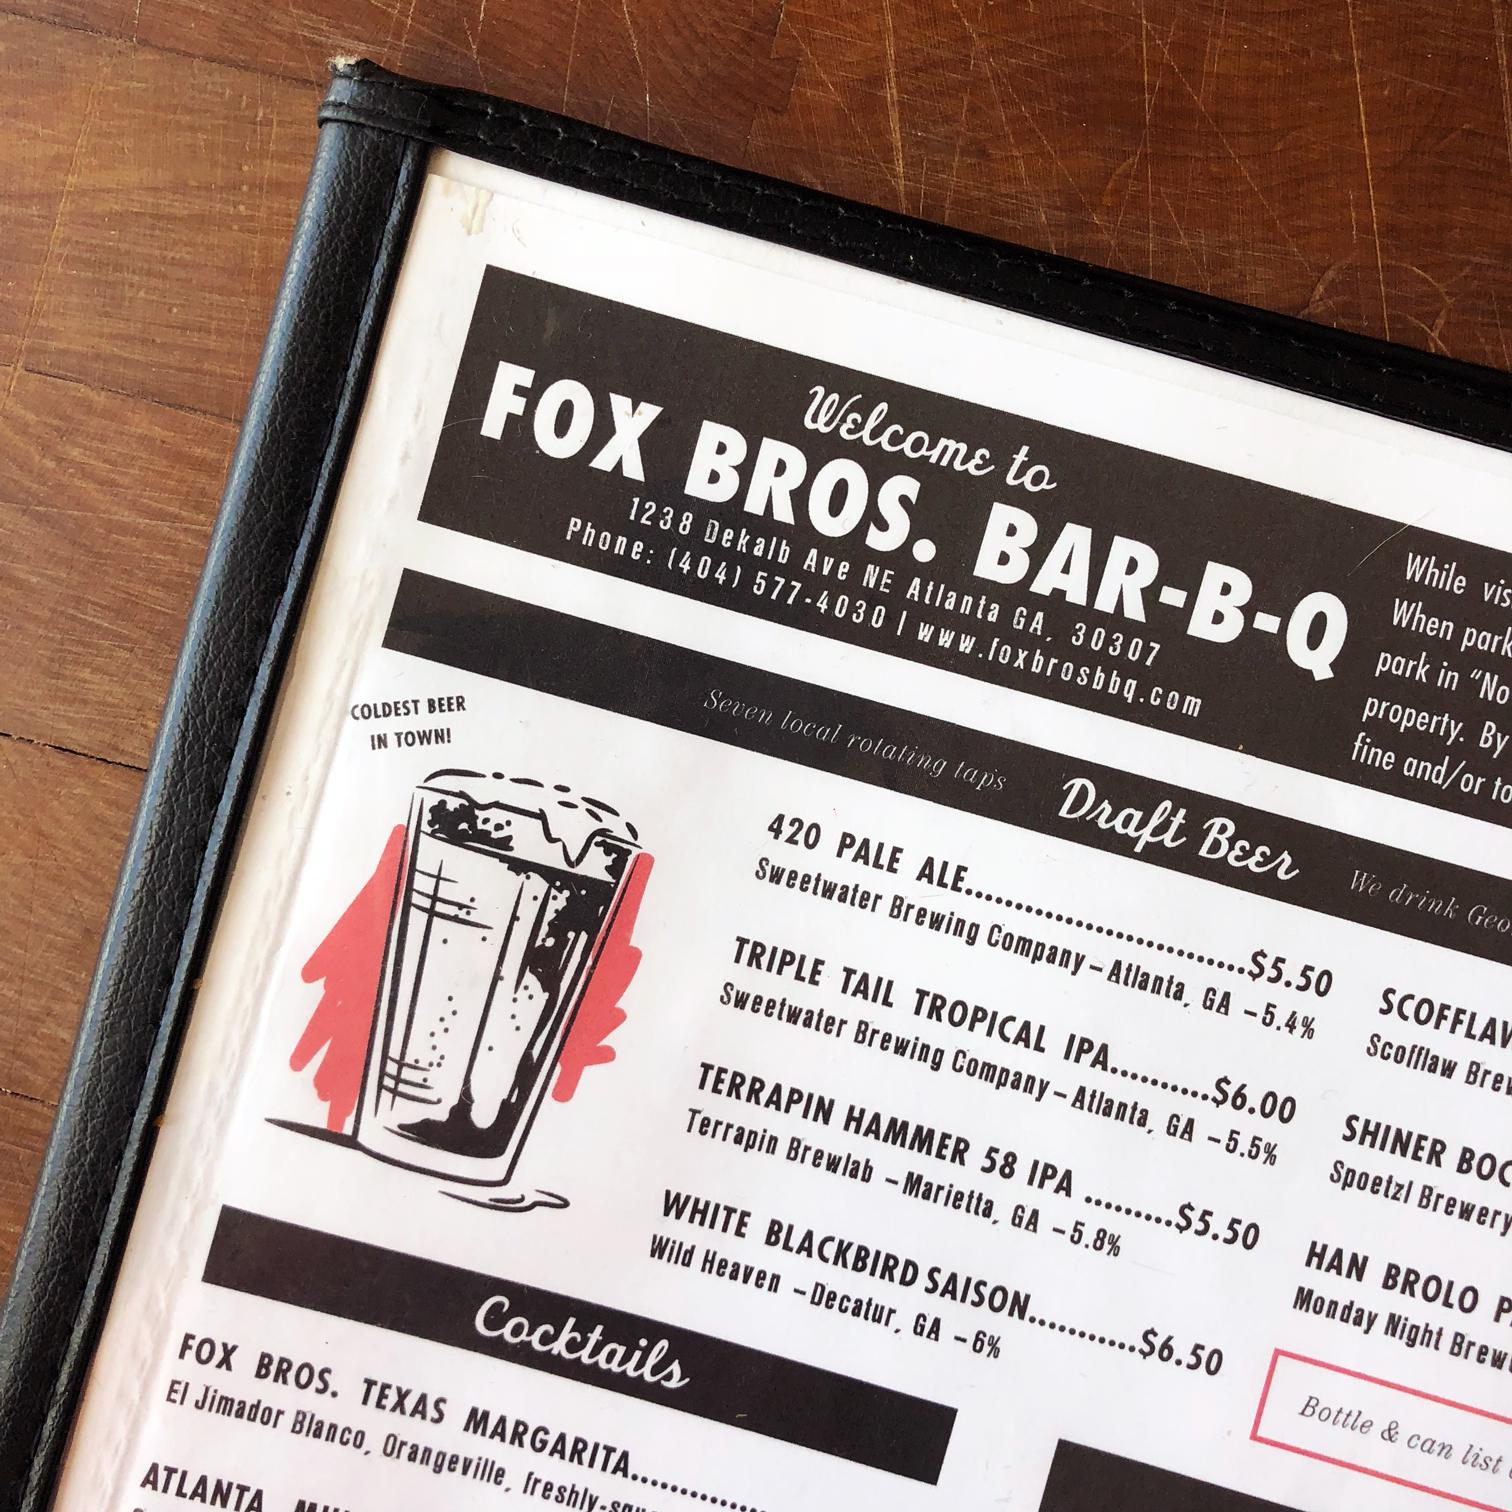 FOX BROS. - Brand Maintenance, Merchandise